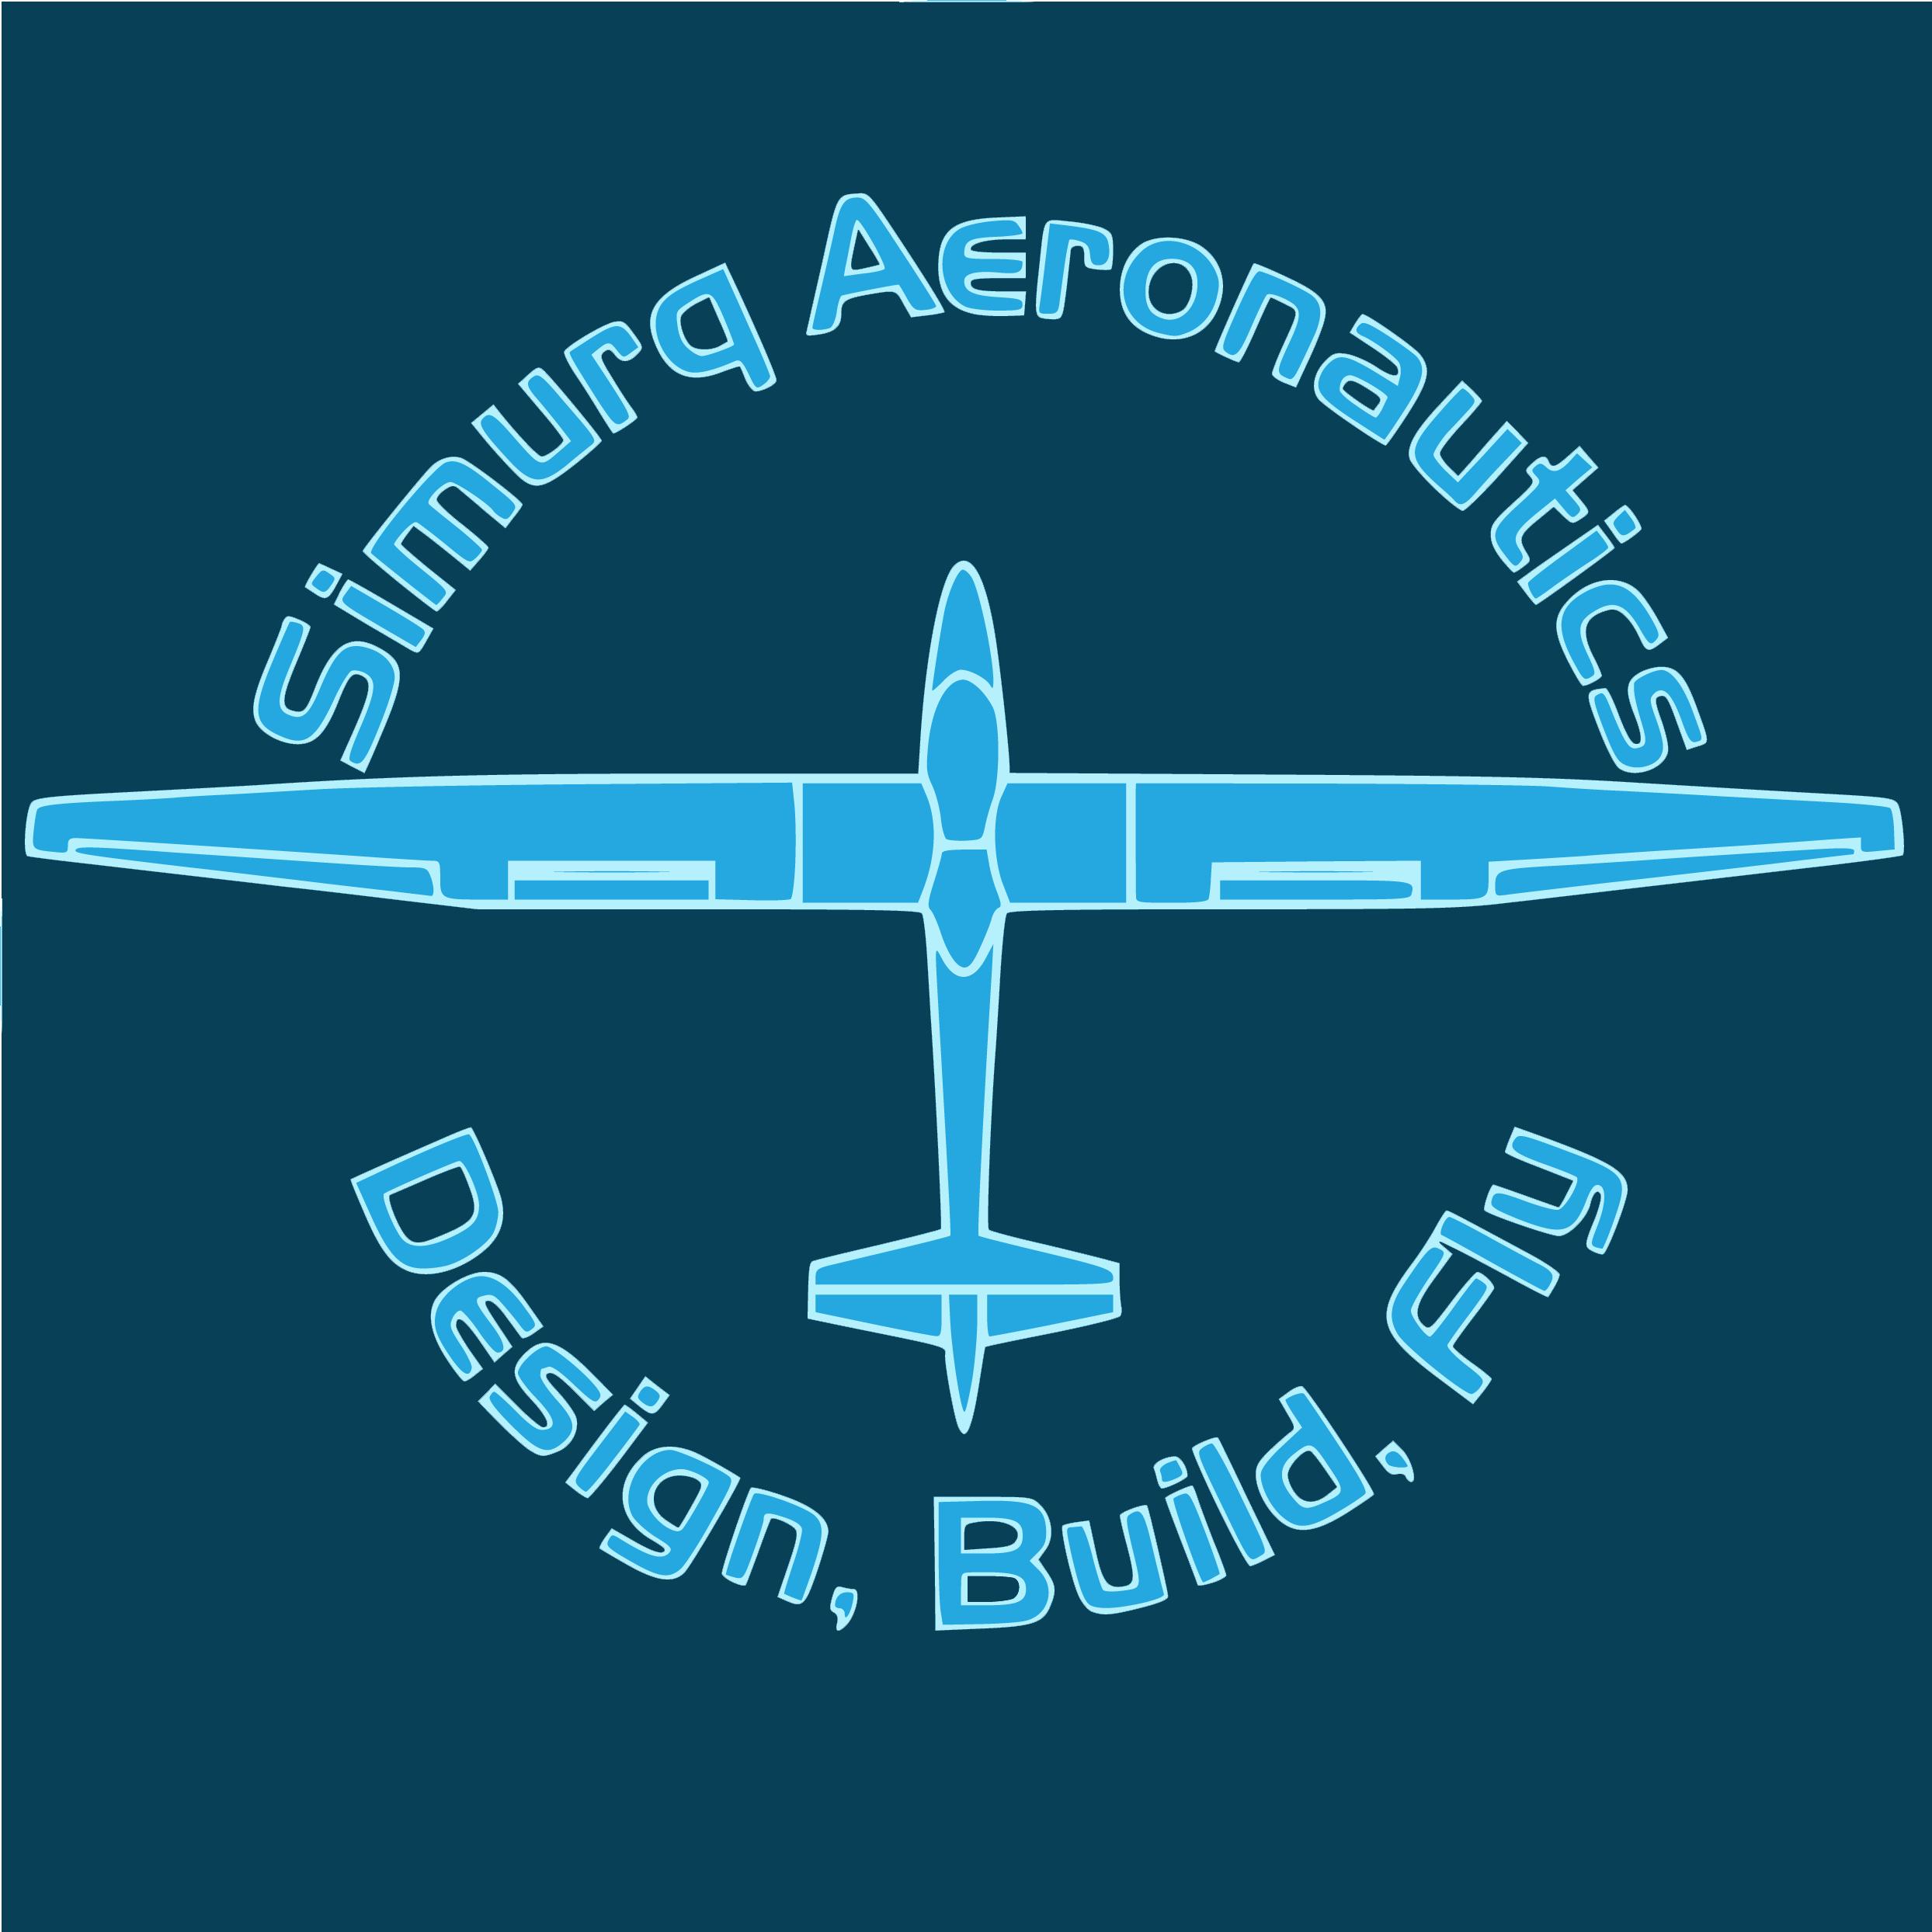 Simurq Aeronautics Society thumbnail